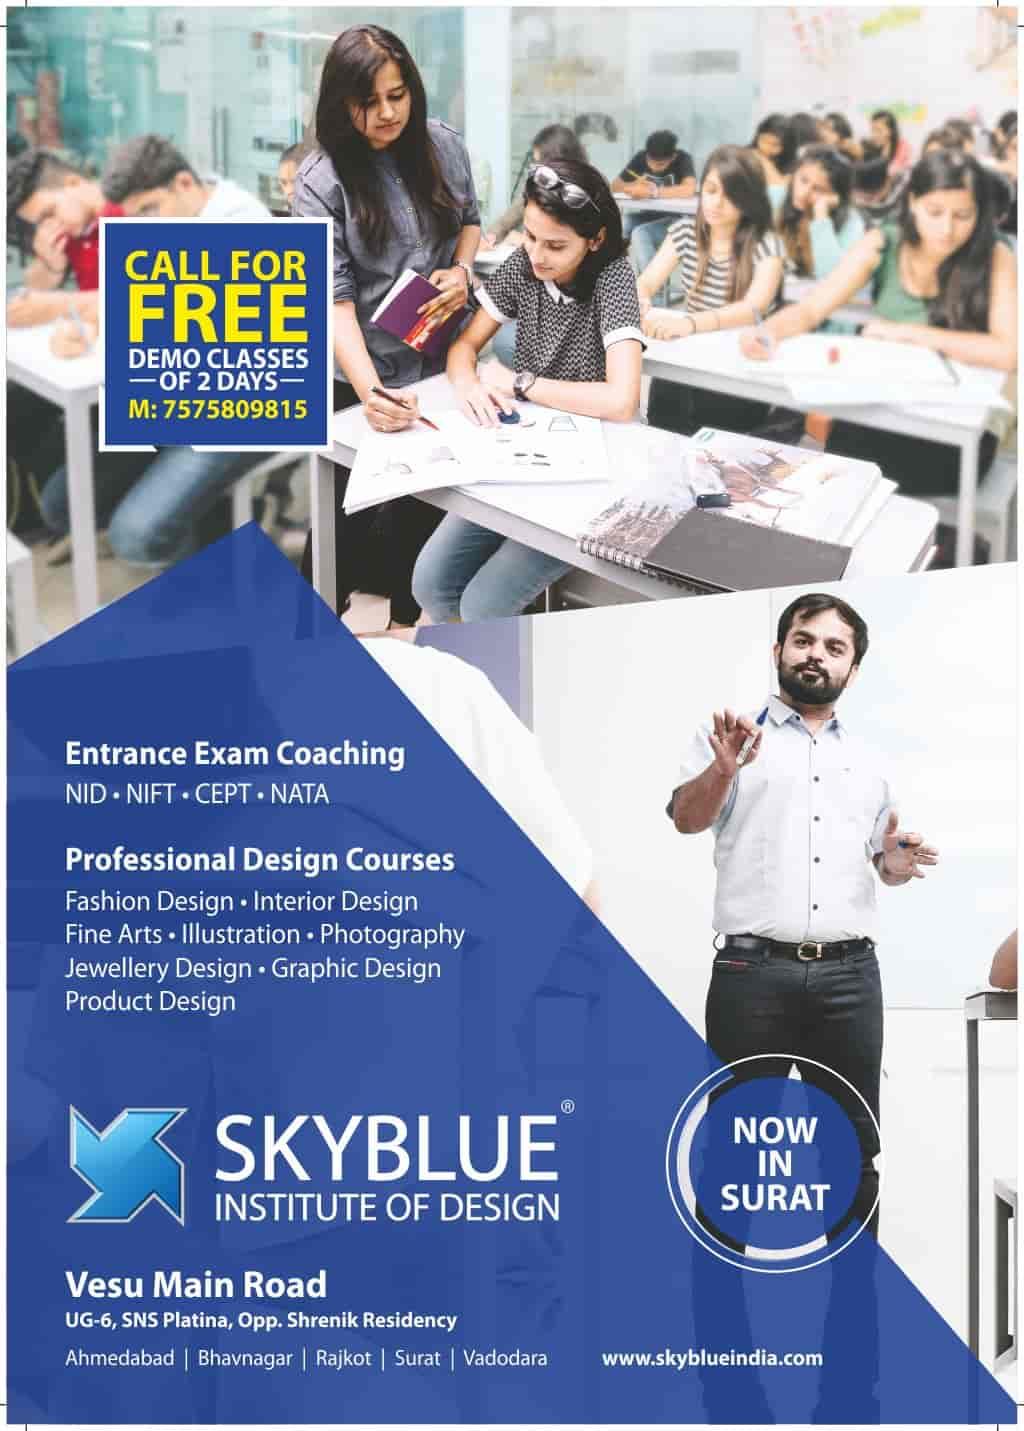 Skyblue Institute Of Design Vesu Tutorials In Surat Justdial